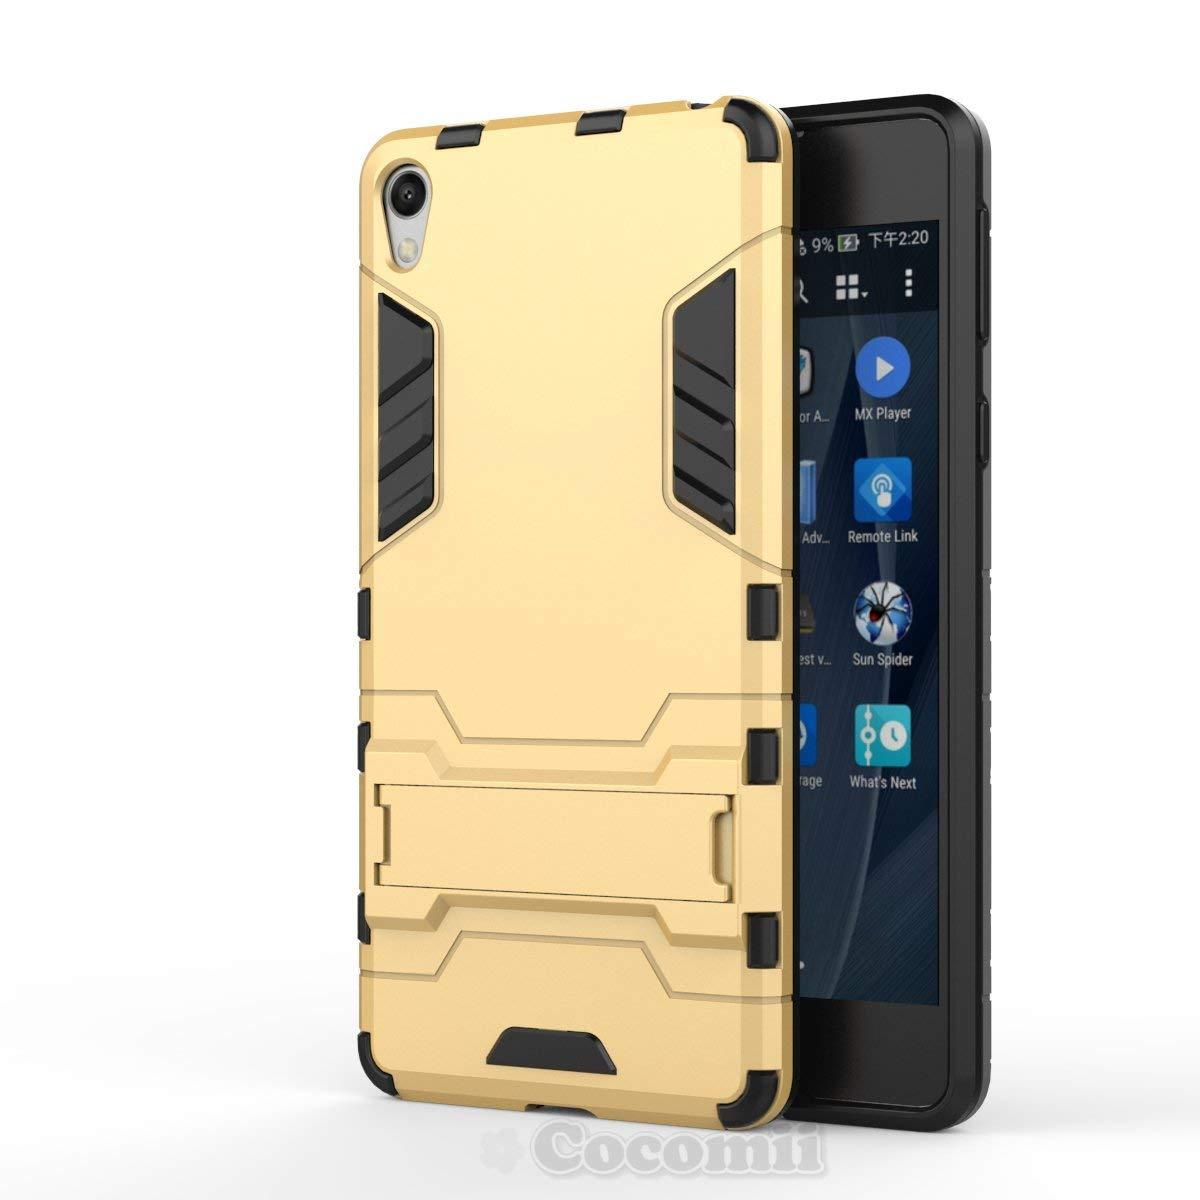 Cocomii Iron Man Armor Sony Xperia E5 Funda [Robusto] Superior Táctico Sujeción Soporte Antichoque Caja [Militar Defensor] Cuerpo Completo Sólido Case ...